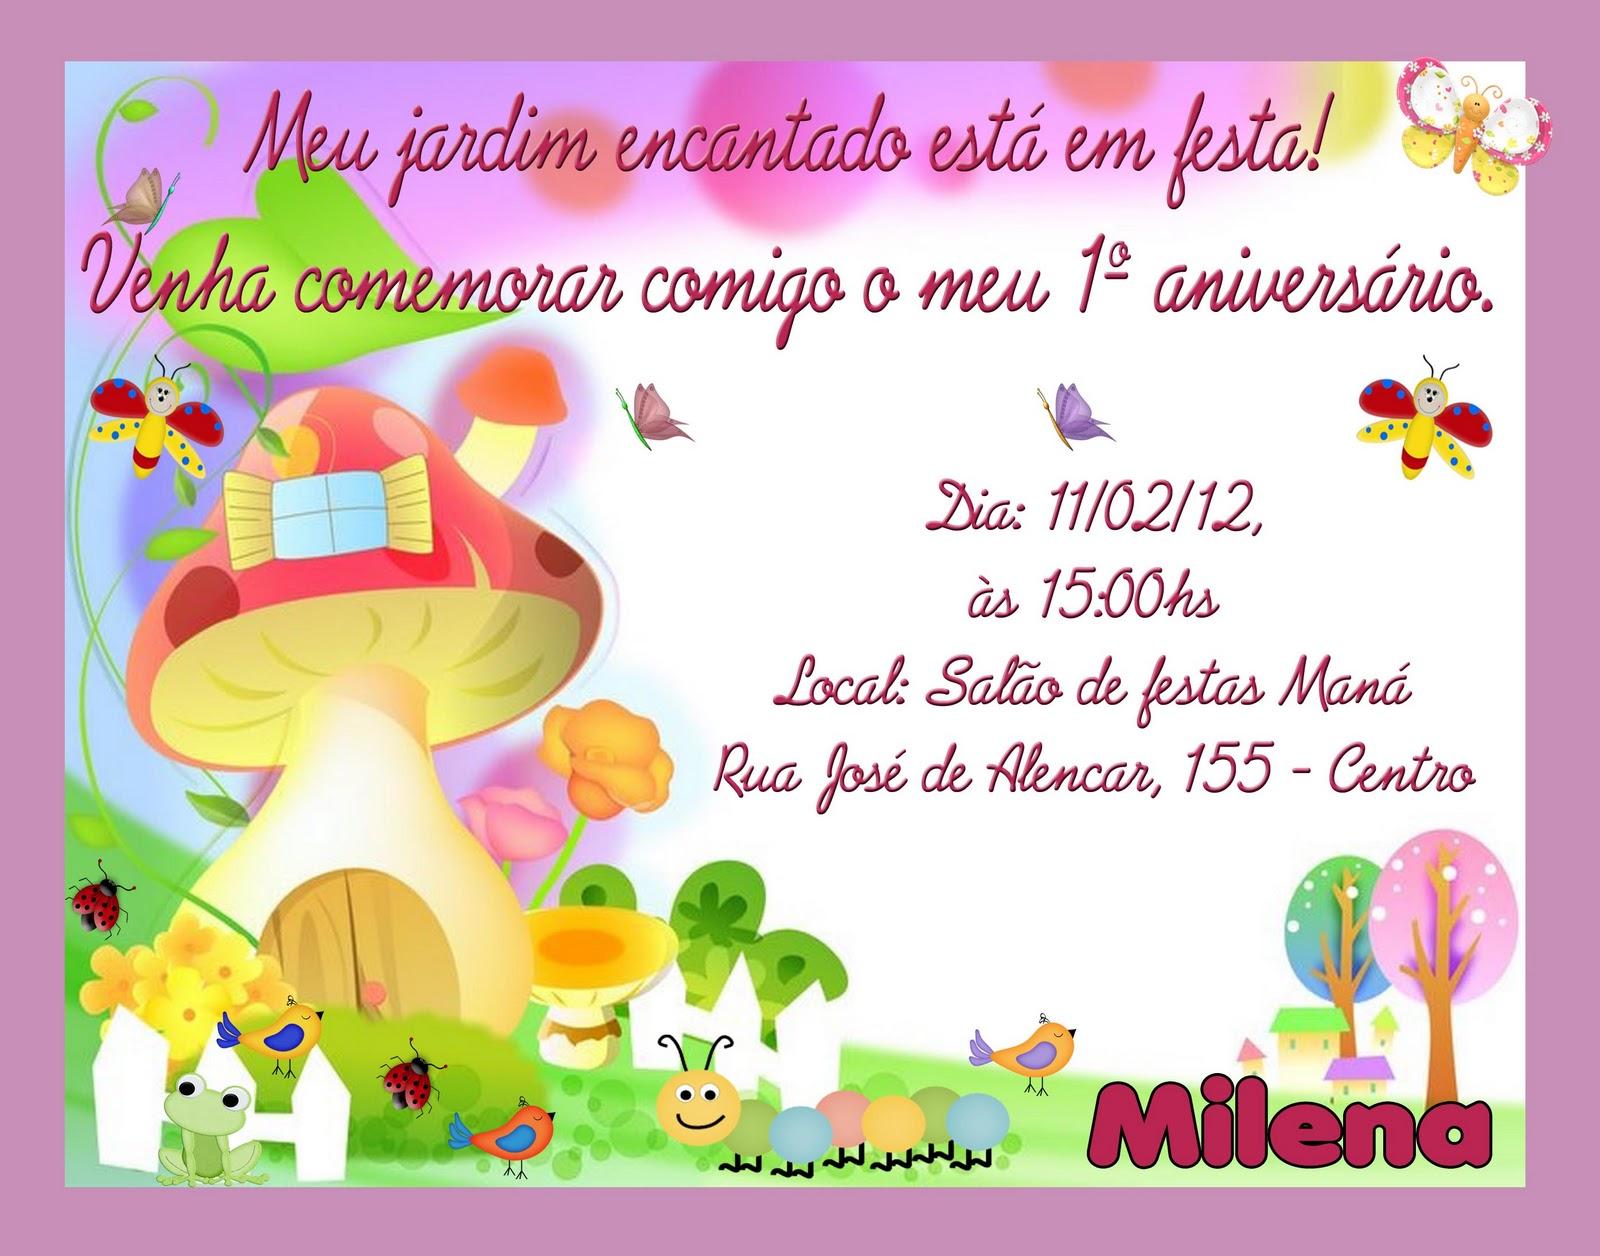 imagens de jardim encantado para convites:Image Convite Anivers Rio Festa Infantil Tema Jardim Encantado